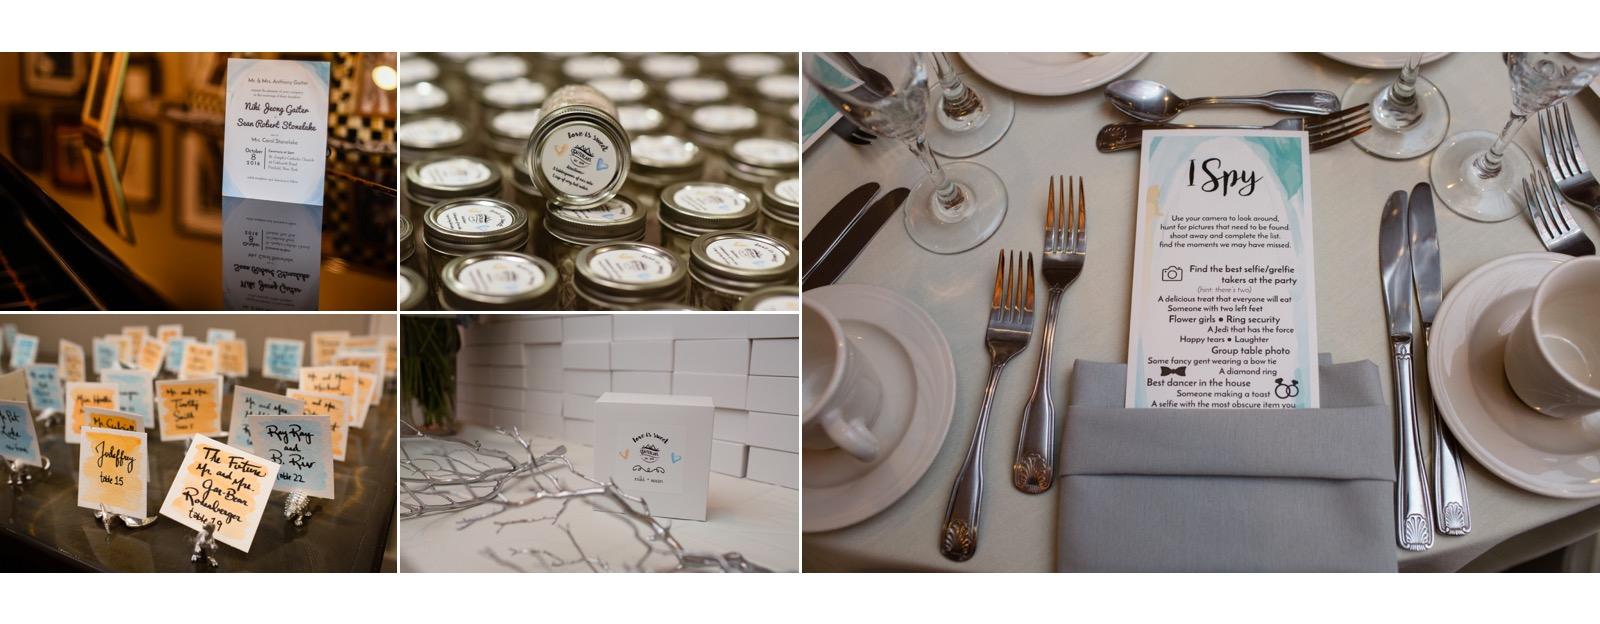 Niki Gaiter the graphic designer created custom wedding stationary